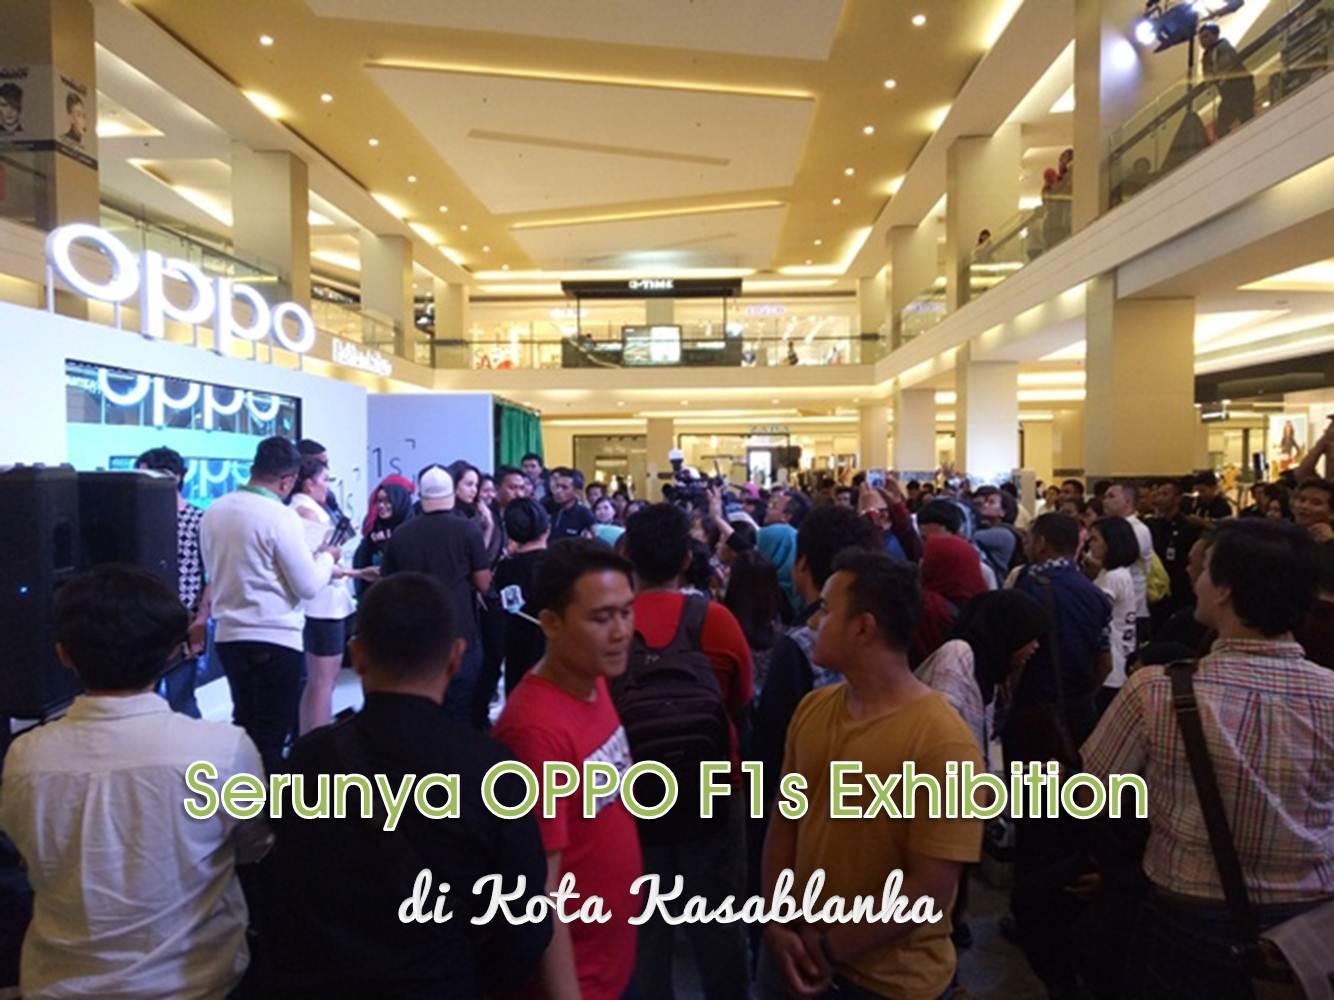 oppo-f1s-exhibition